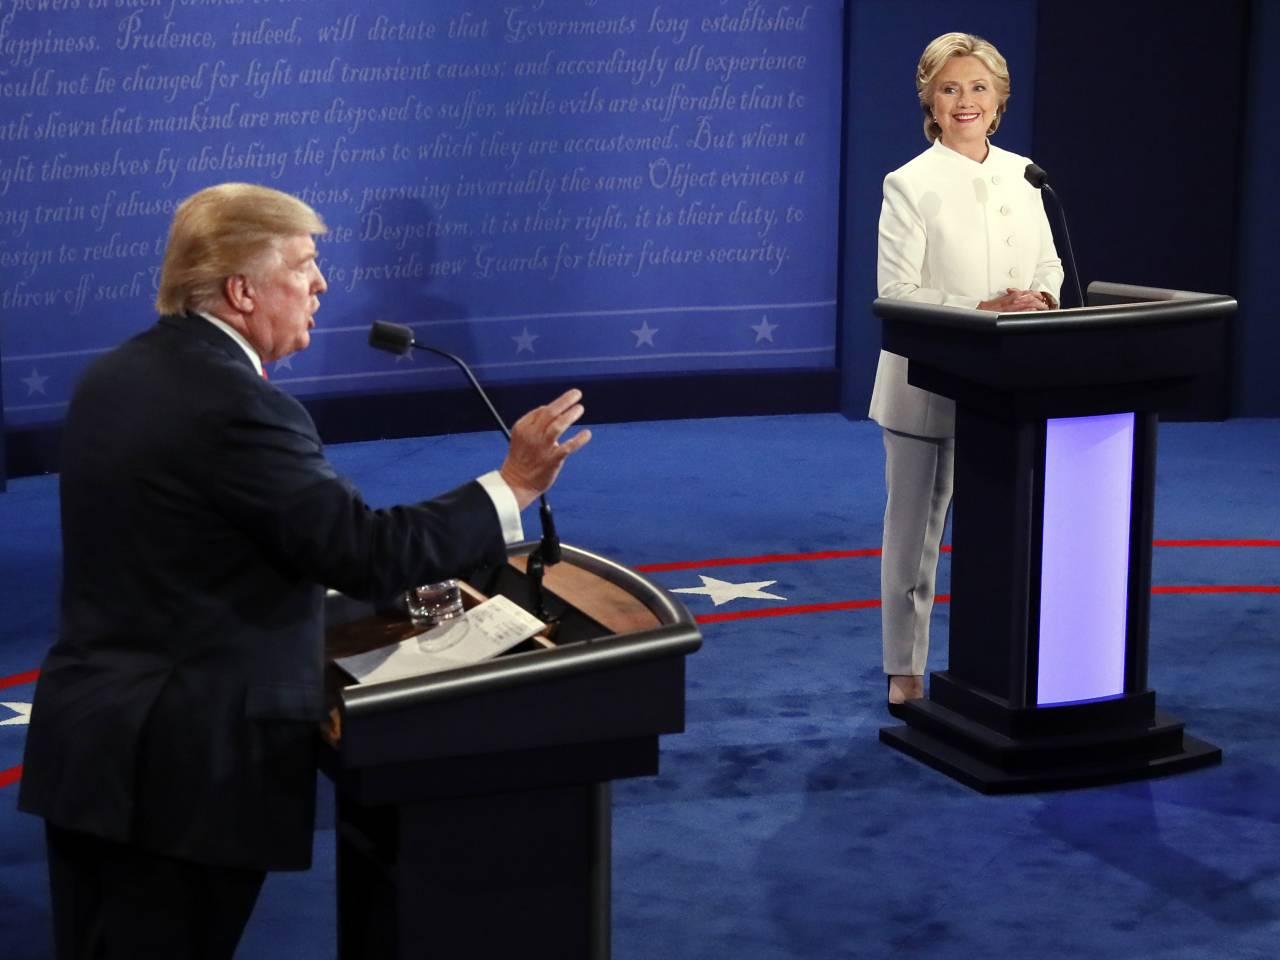 Republican presidential nominee Donald Trump debates Democratic presidential nominee Hillary Clinton during the third presidential debate at UNLV in Las Vegas, Wednesday, Oct. 19, 2016. (Mark Ralston/Pool via AP)